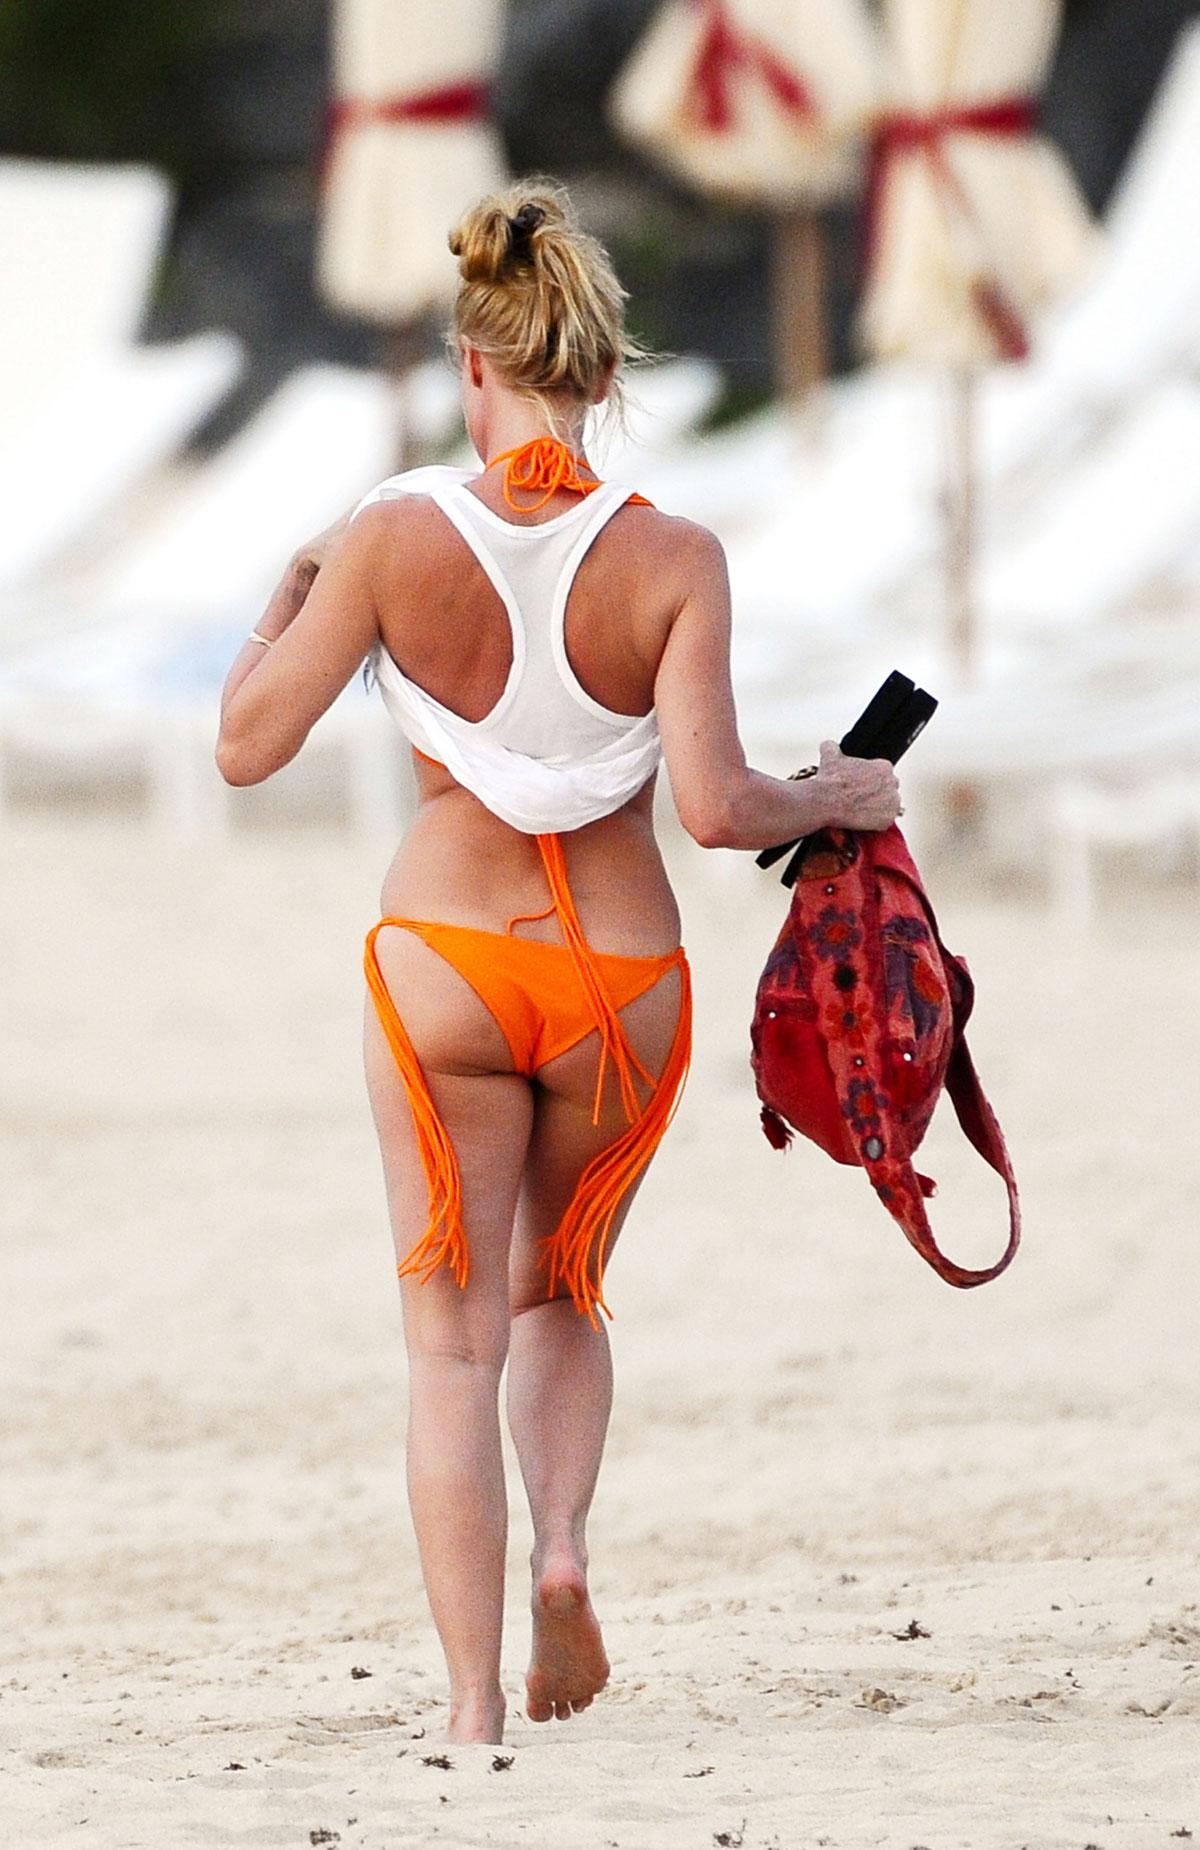 Bikini Nicolette Sheridan nudes (76 photos), Tits, Sideboobs, Twitter, cameltoe 2020